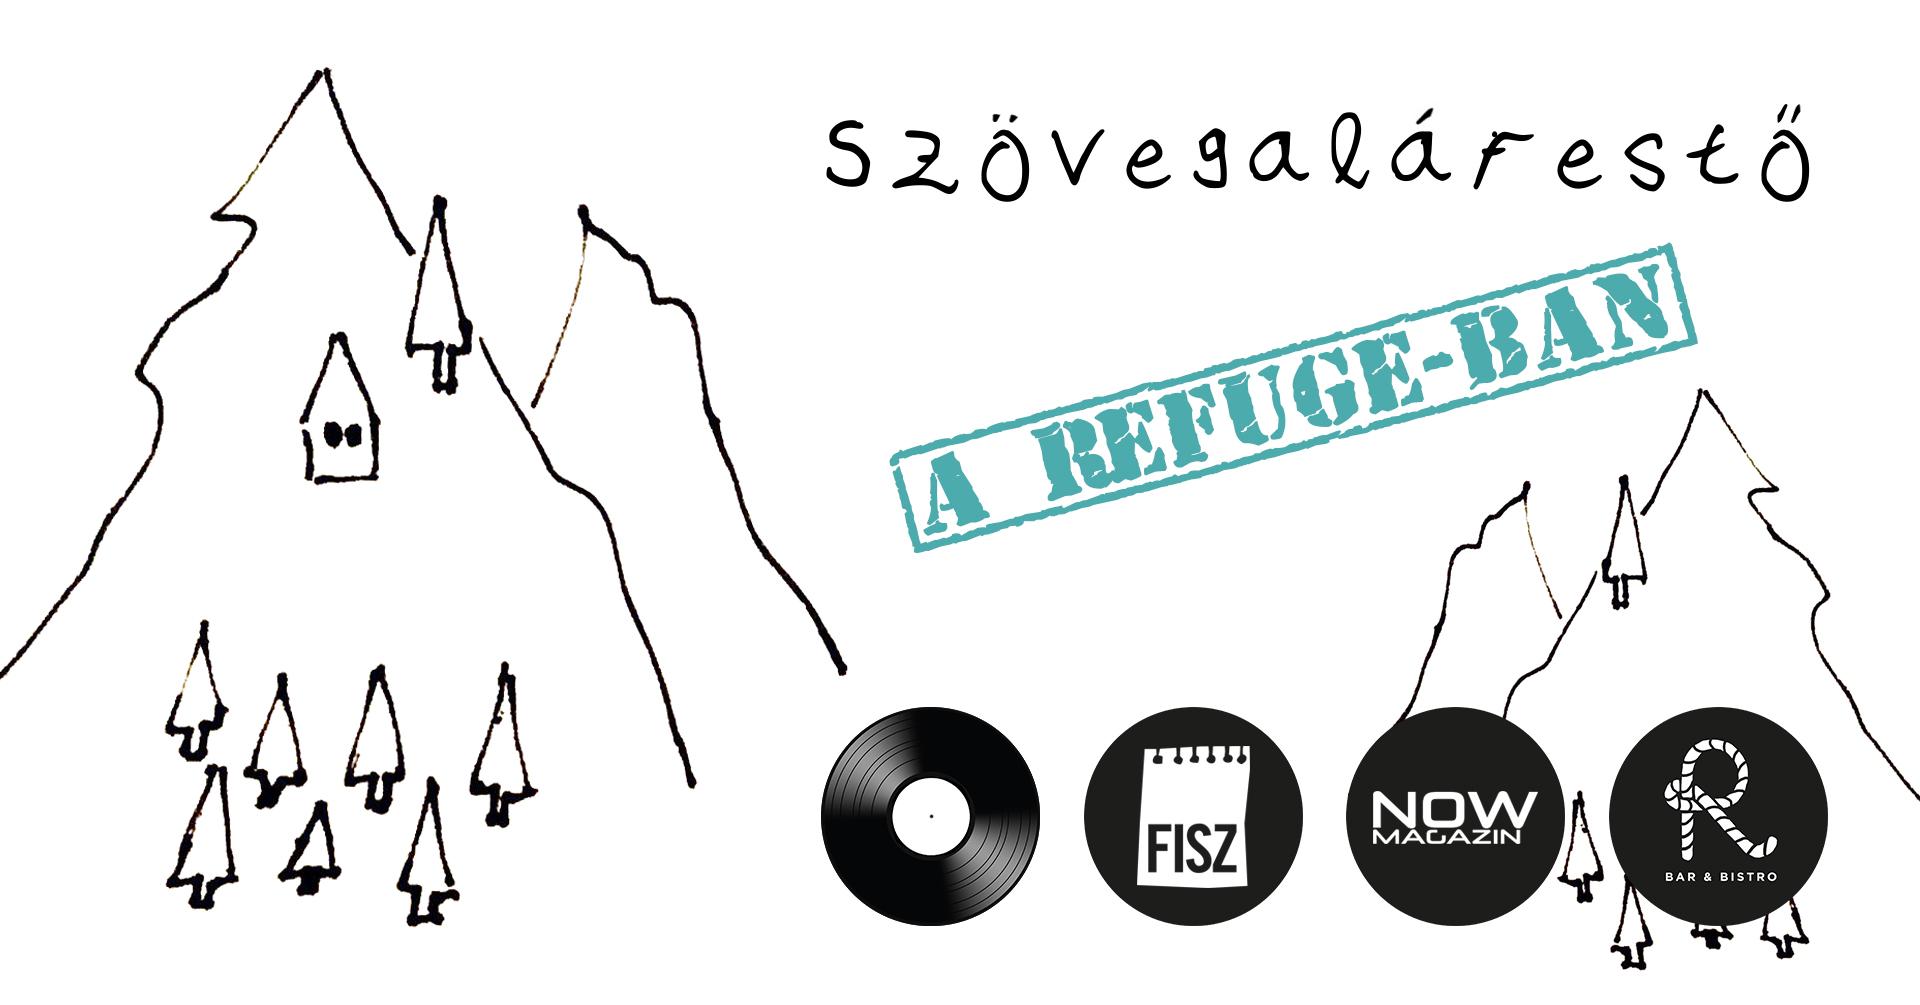 szovegalafesto_refuge.jpg